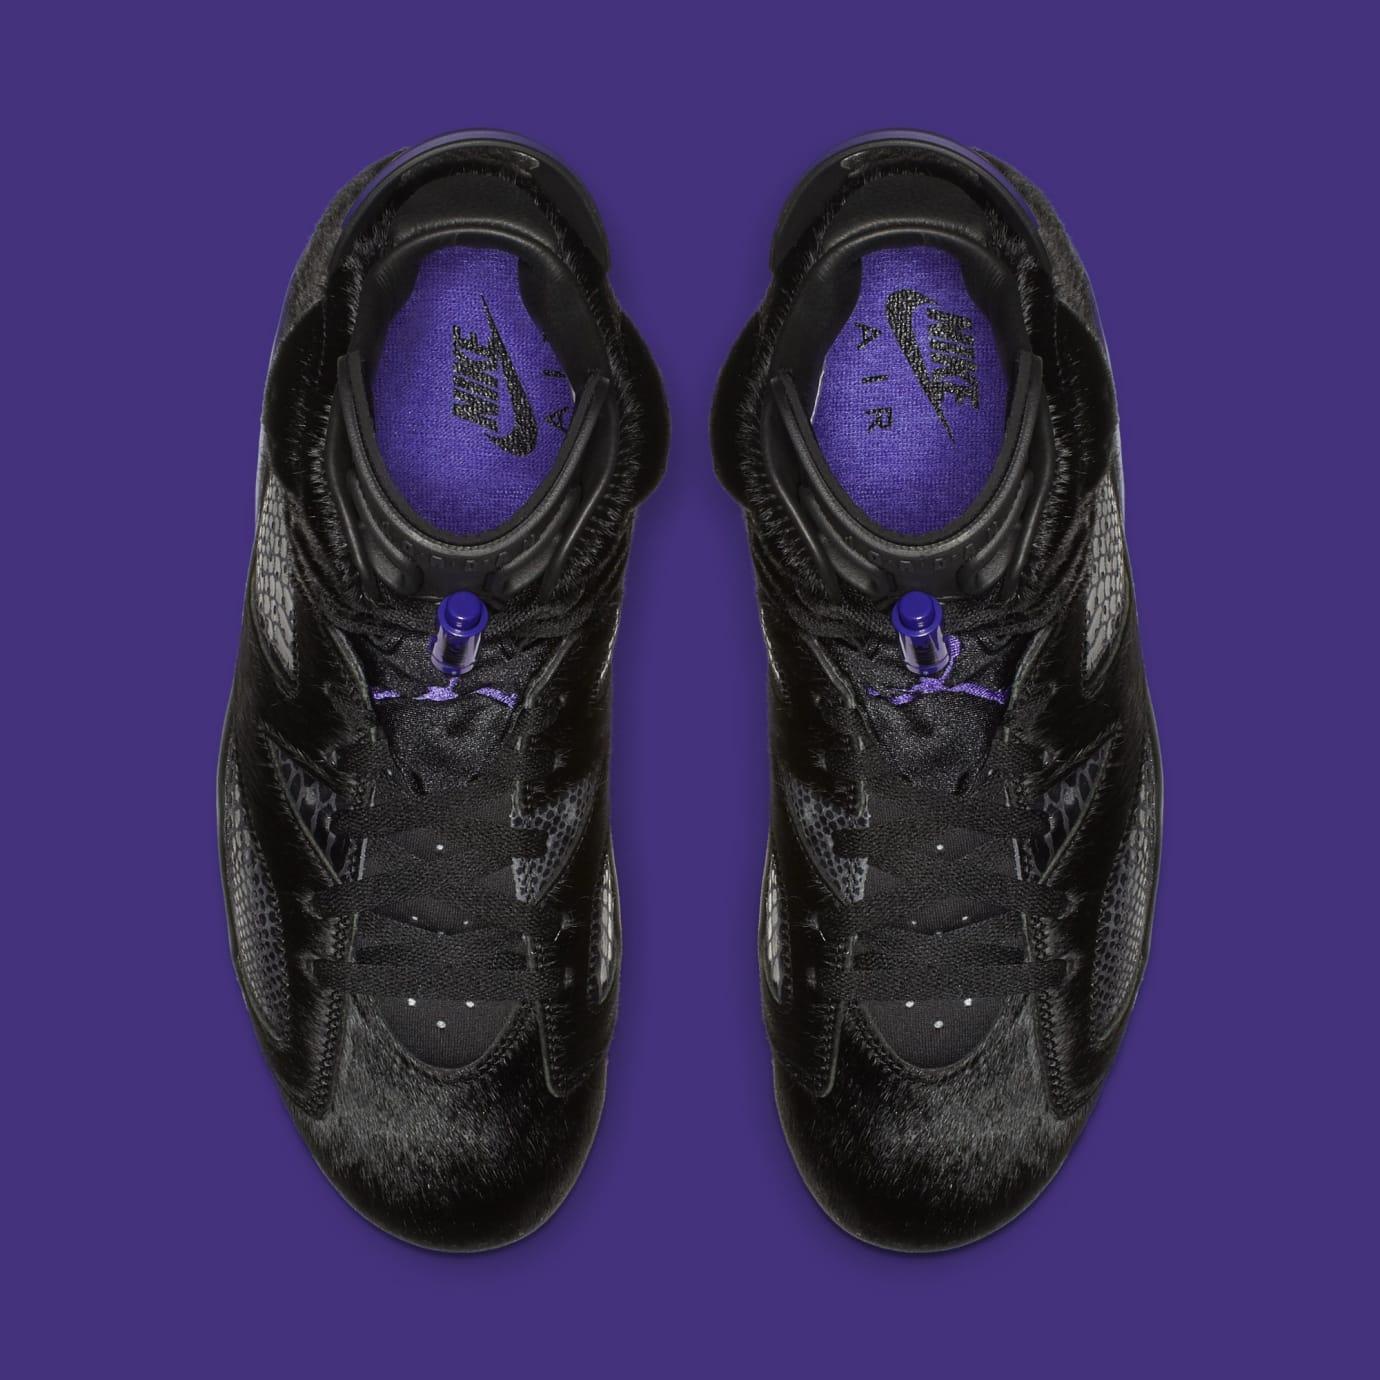 4361552a16ad Image via Nike Social Status x Air Jordan 6 NRG  Black Dark Concord  AR2257- 005